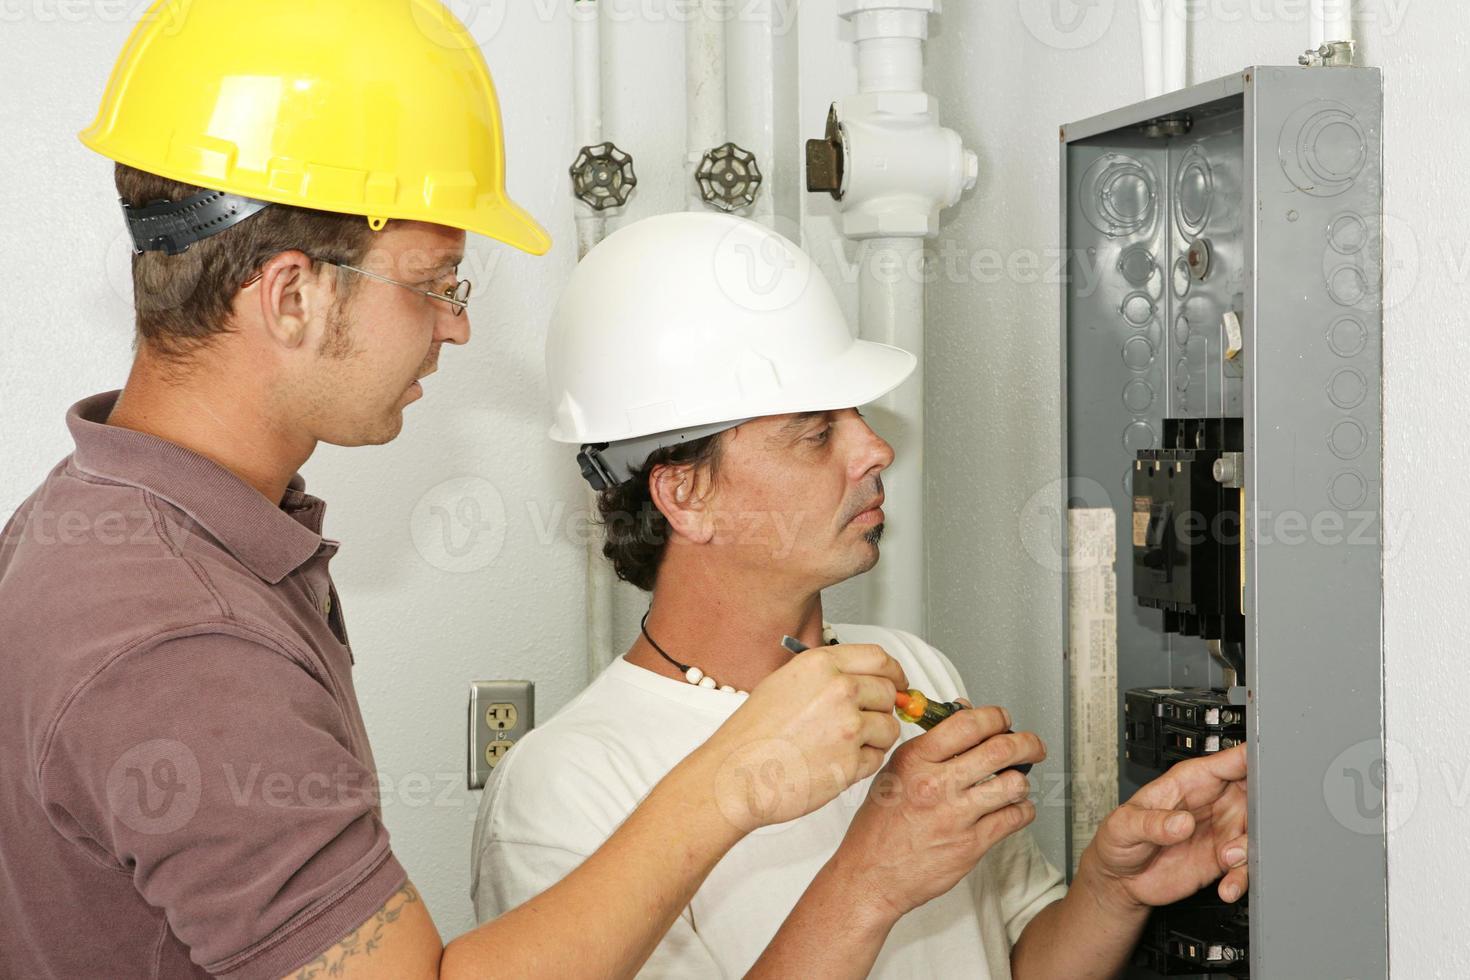 elektriciens bedradingspaneel foto